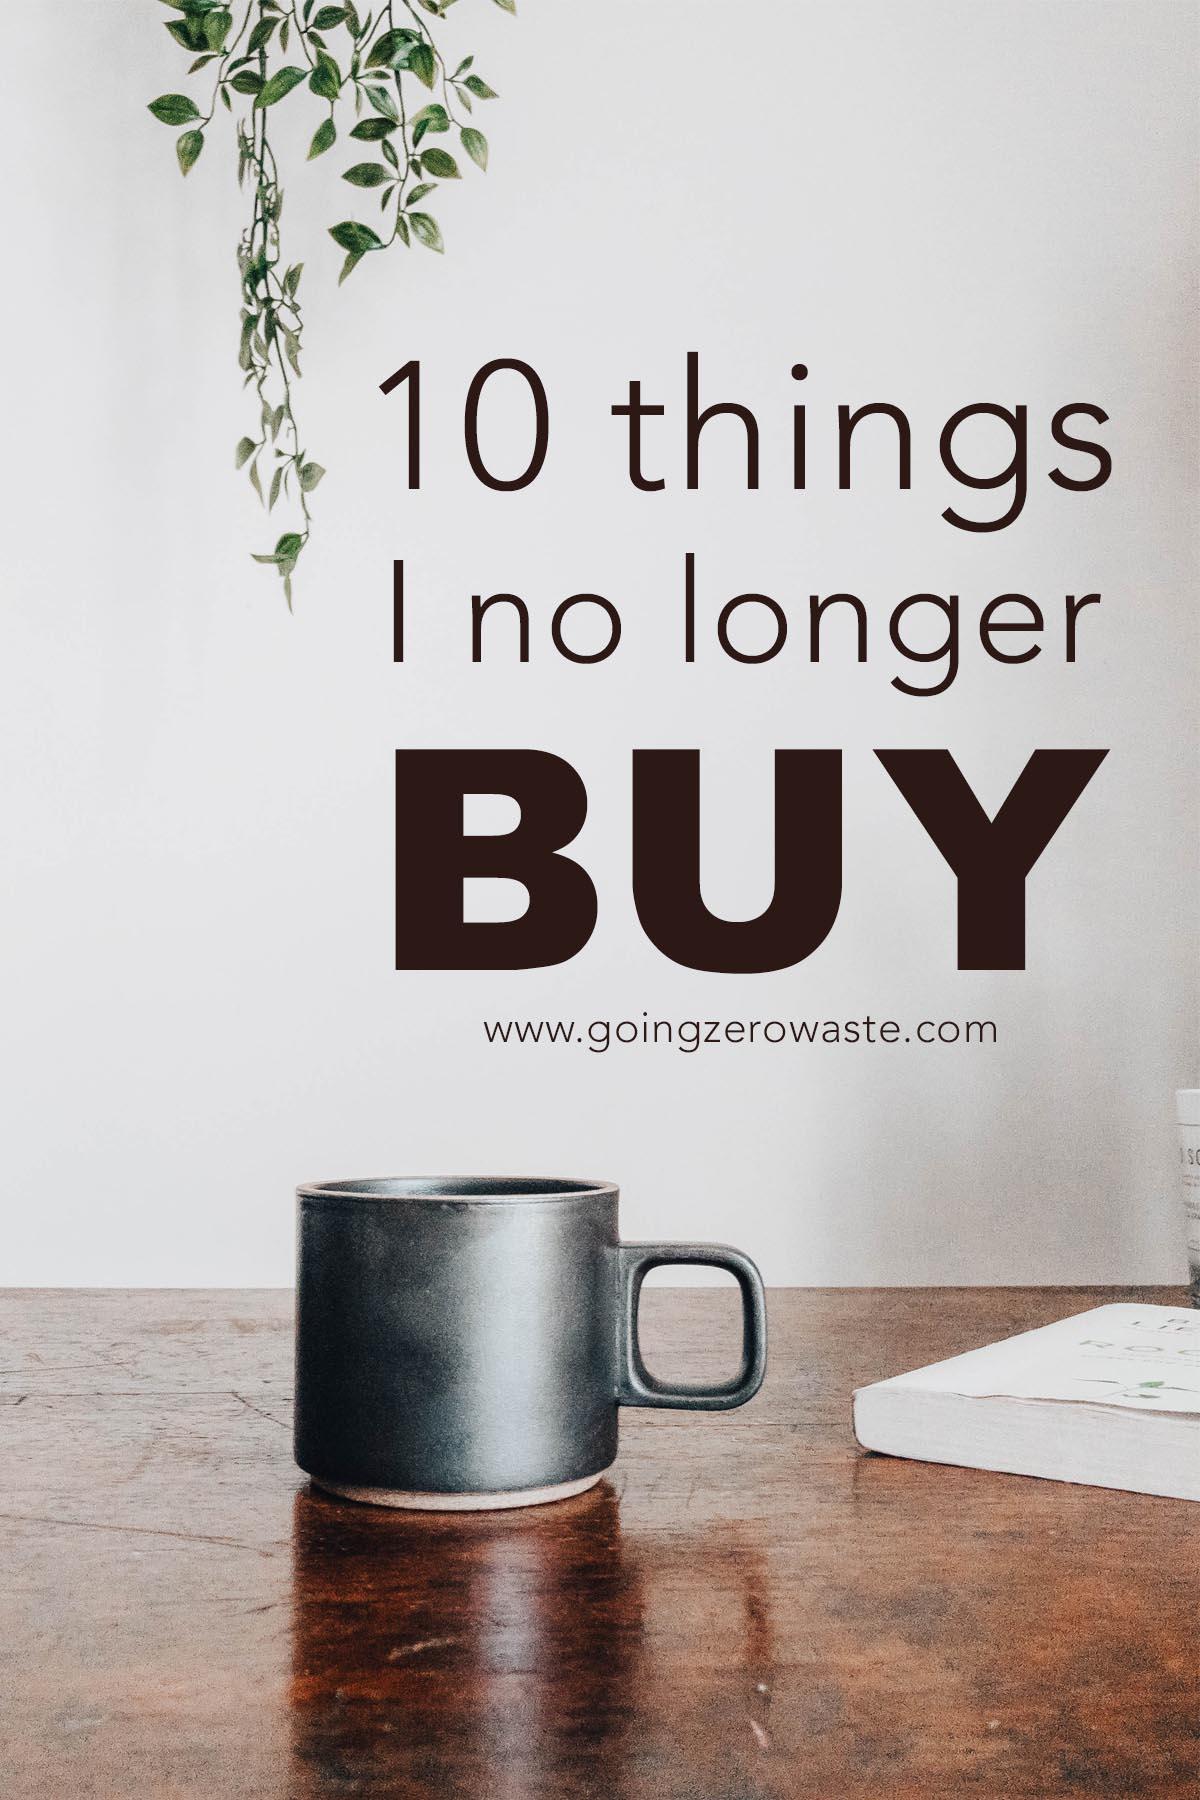 10 things I no longer buy from www.goingzerowaste.com #minimalism #nobuy #nospend #zerowaste #ecofriendly #gogreen